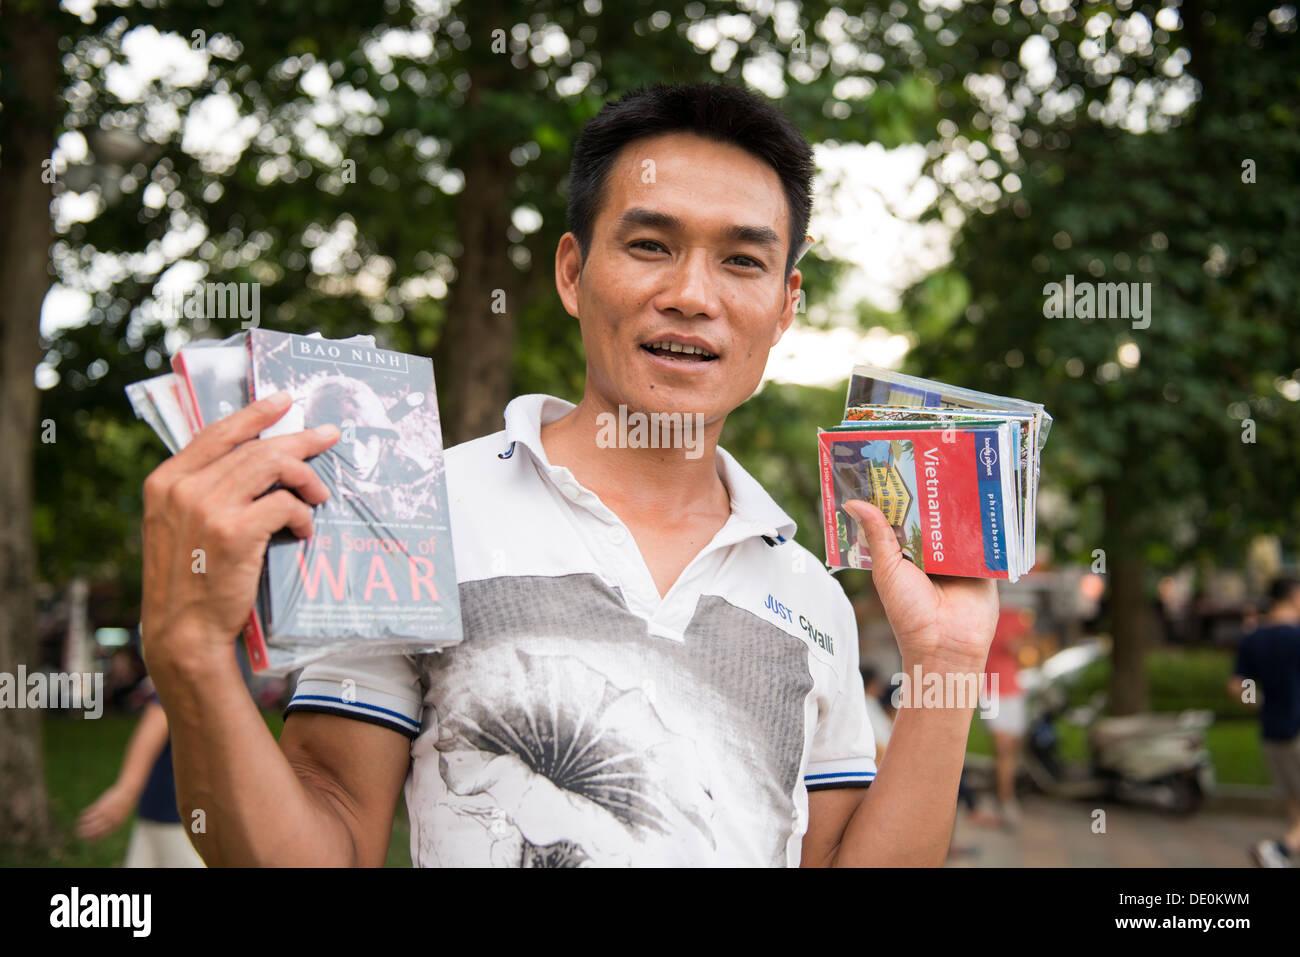 Paddling book seller in Hoan Kiem lake side, Hanoi, Vietnam - Stock Image